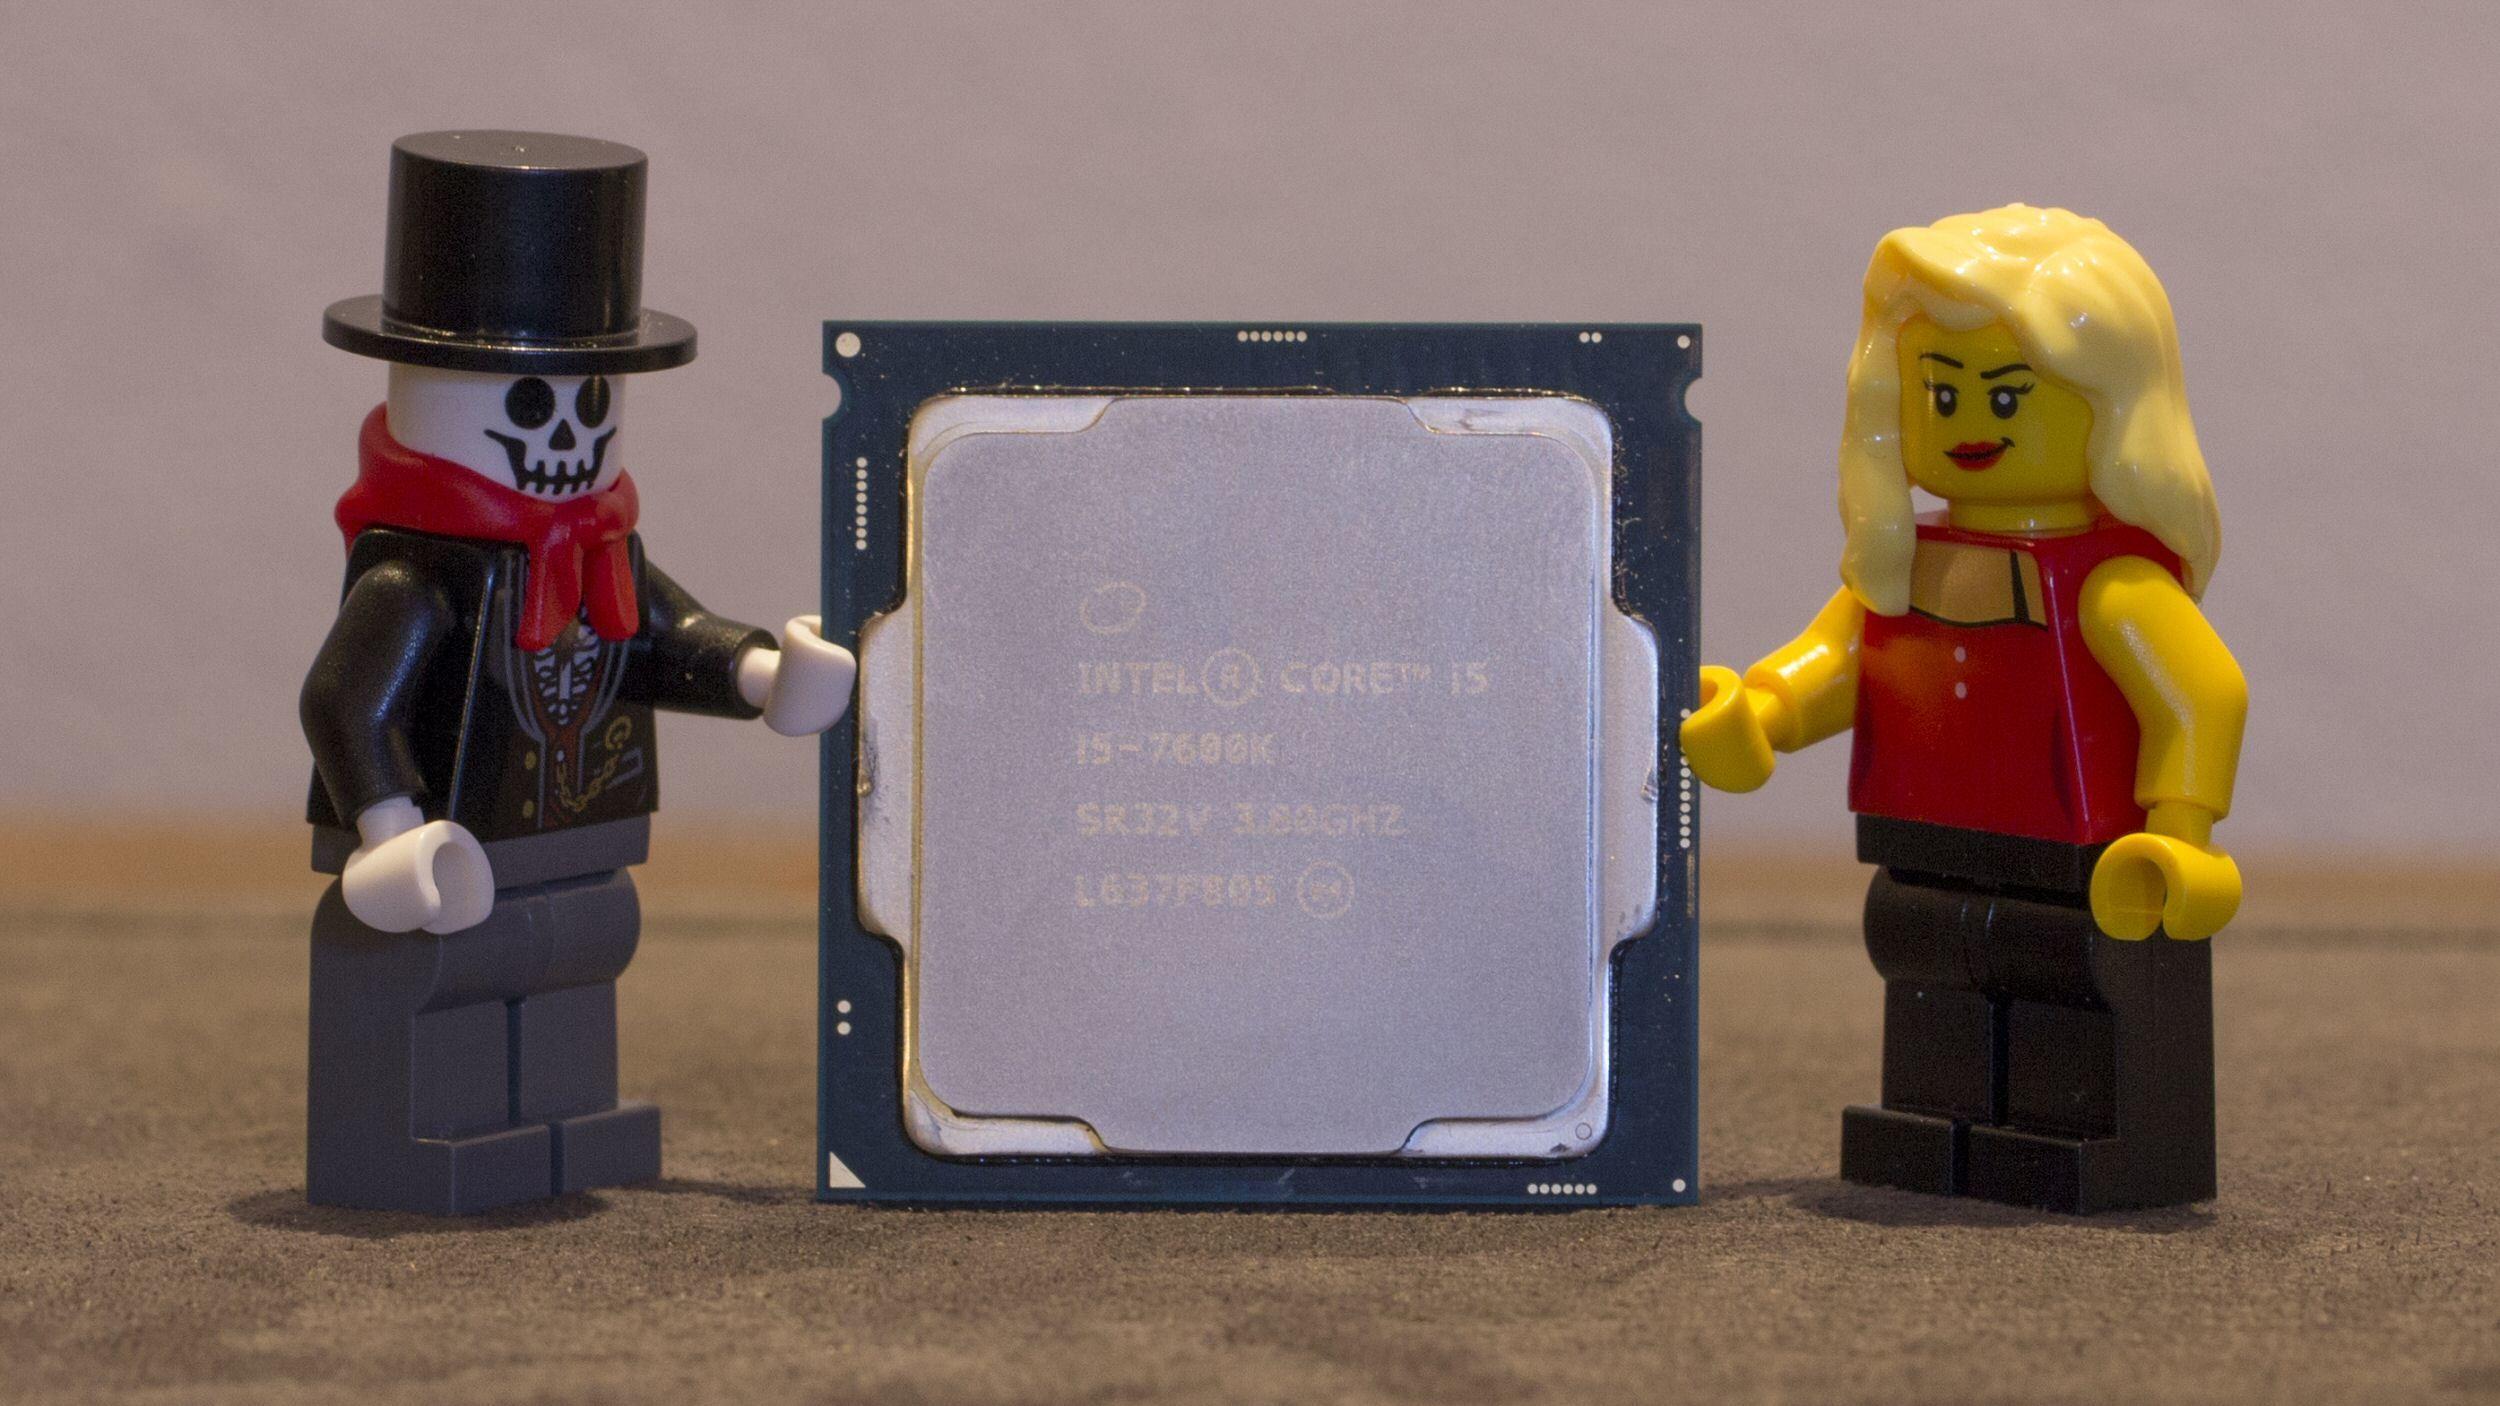 Intel Core i5-7600K